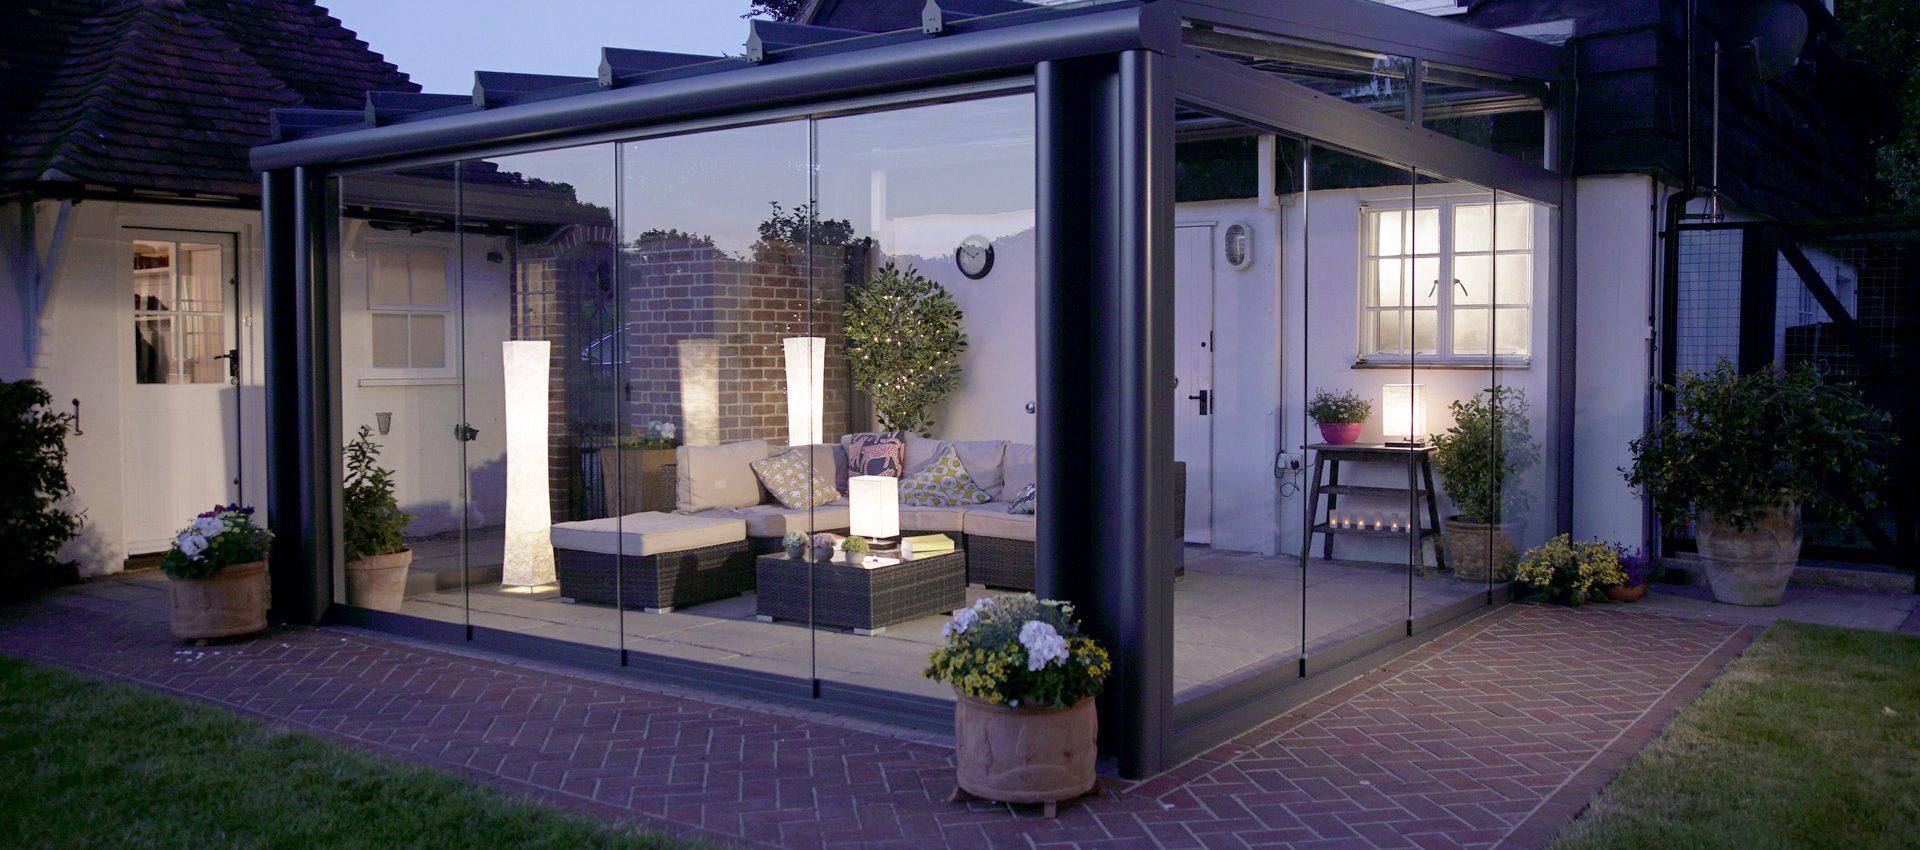 veranda-aspect-ratio-1920-850